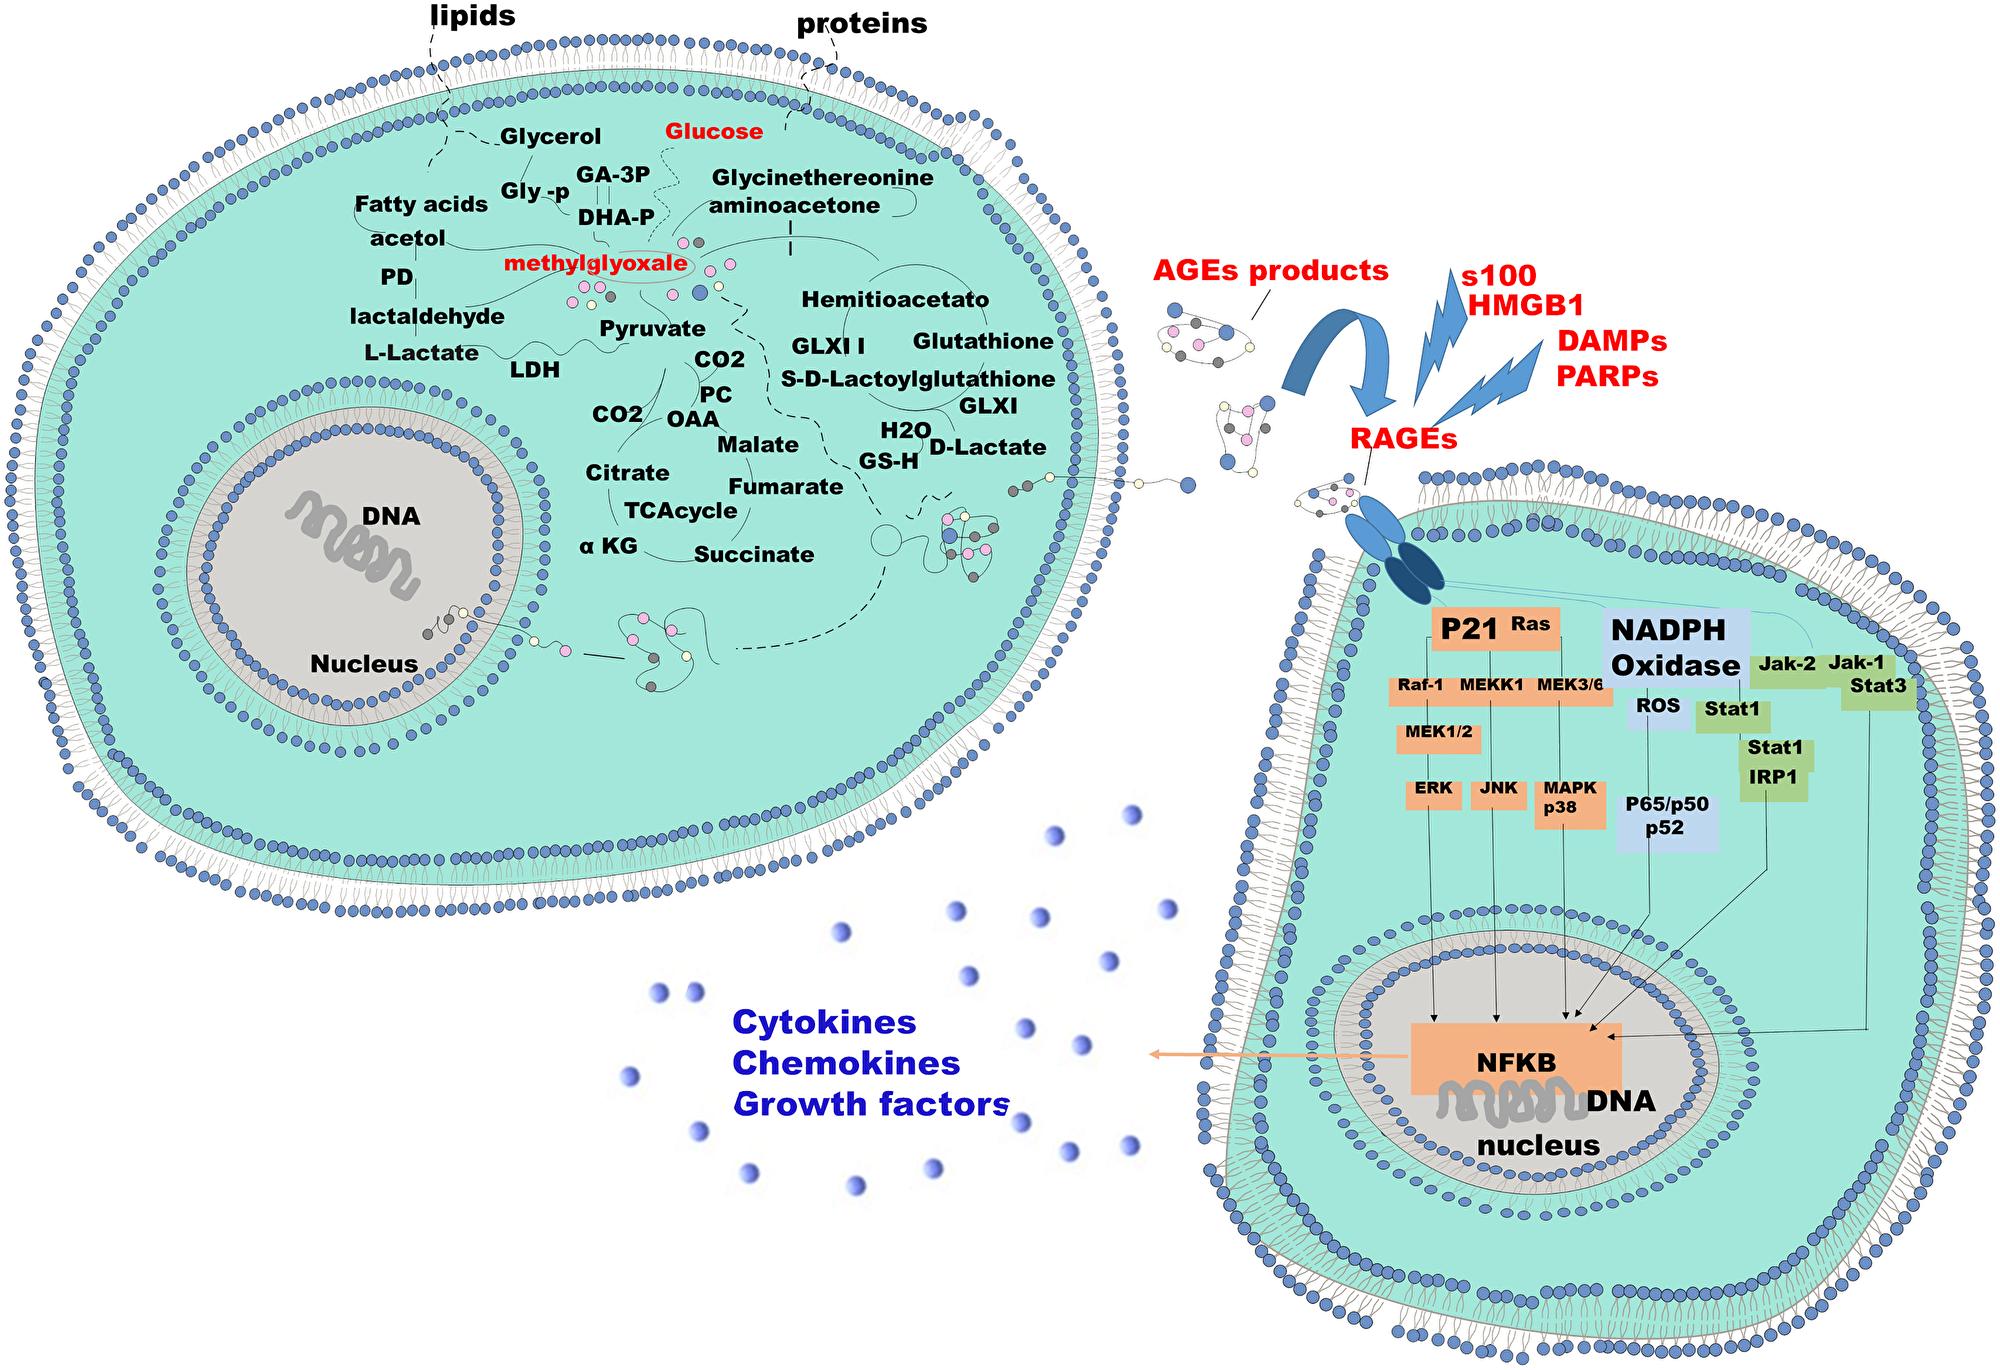 Mechanism of endogenous AGE formation and pathobiological actions of RAGE receptor ligands.